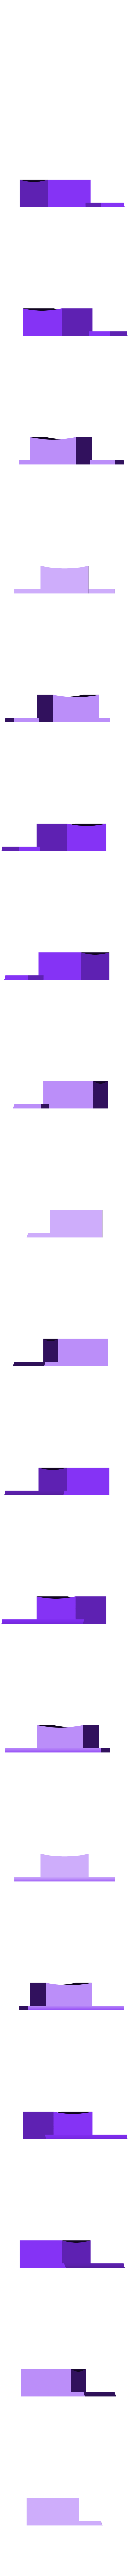 MakerBot_-_Rear_Engine-_SCALED-10-b.STL Download free STL file 4-8-8-4 Big Boy Locomotive • 3D printer object, RaymondDeLuca